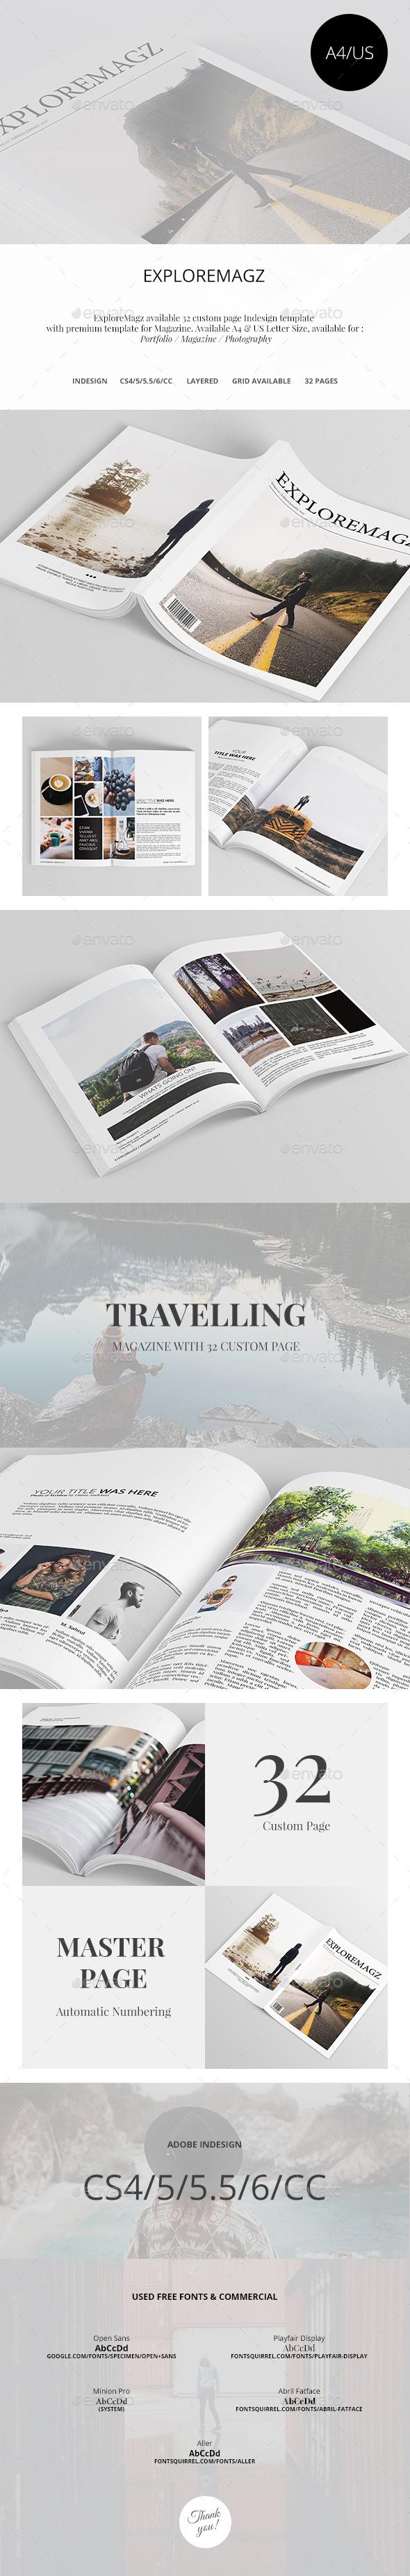 Exploremagz Magazine Template InDesign INDD #design Download: http ...